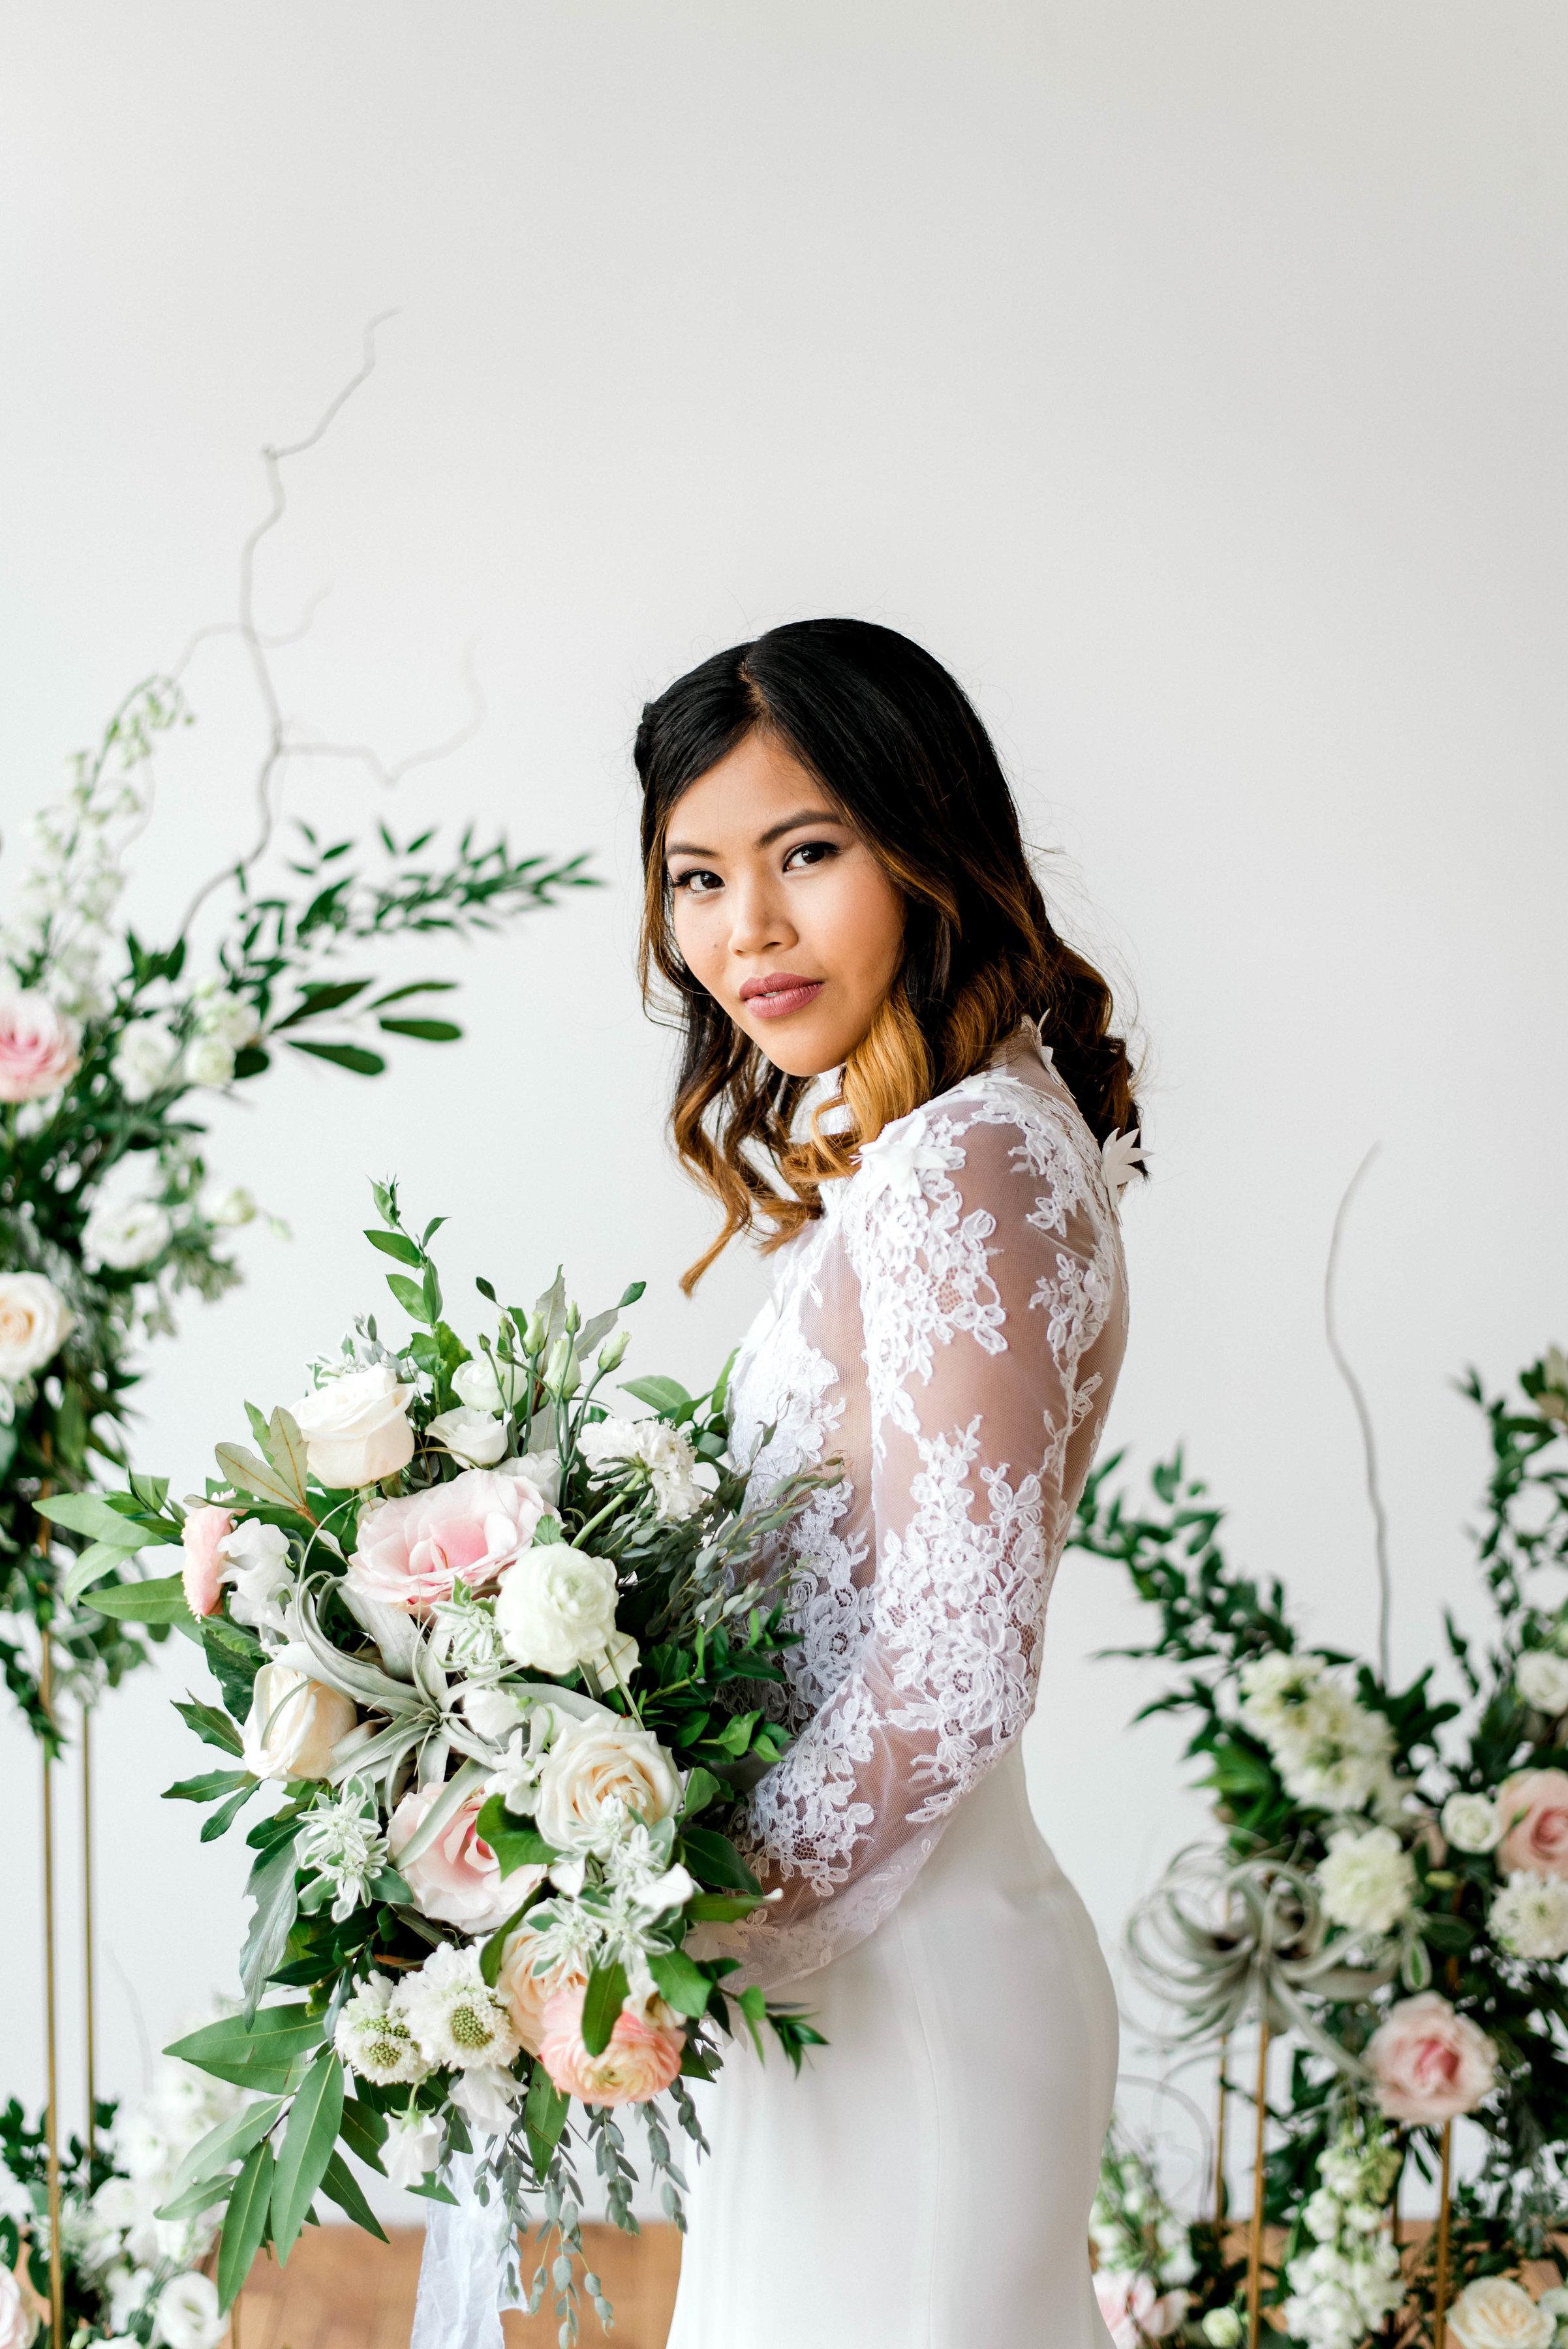 Lyons-Events-Elizabeth-Leese-Lace-Bridal-Gown-Wedding-Dress